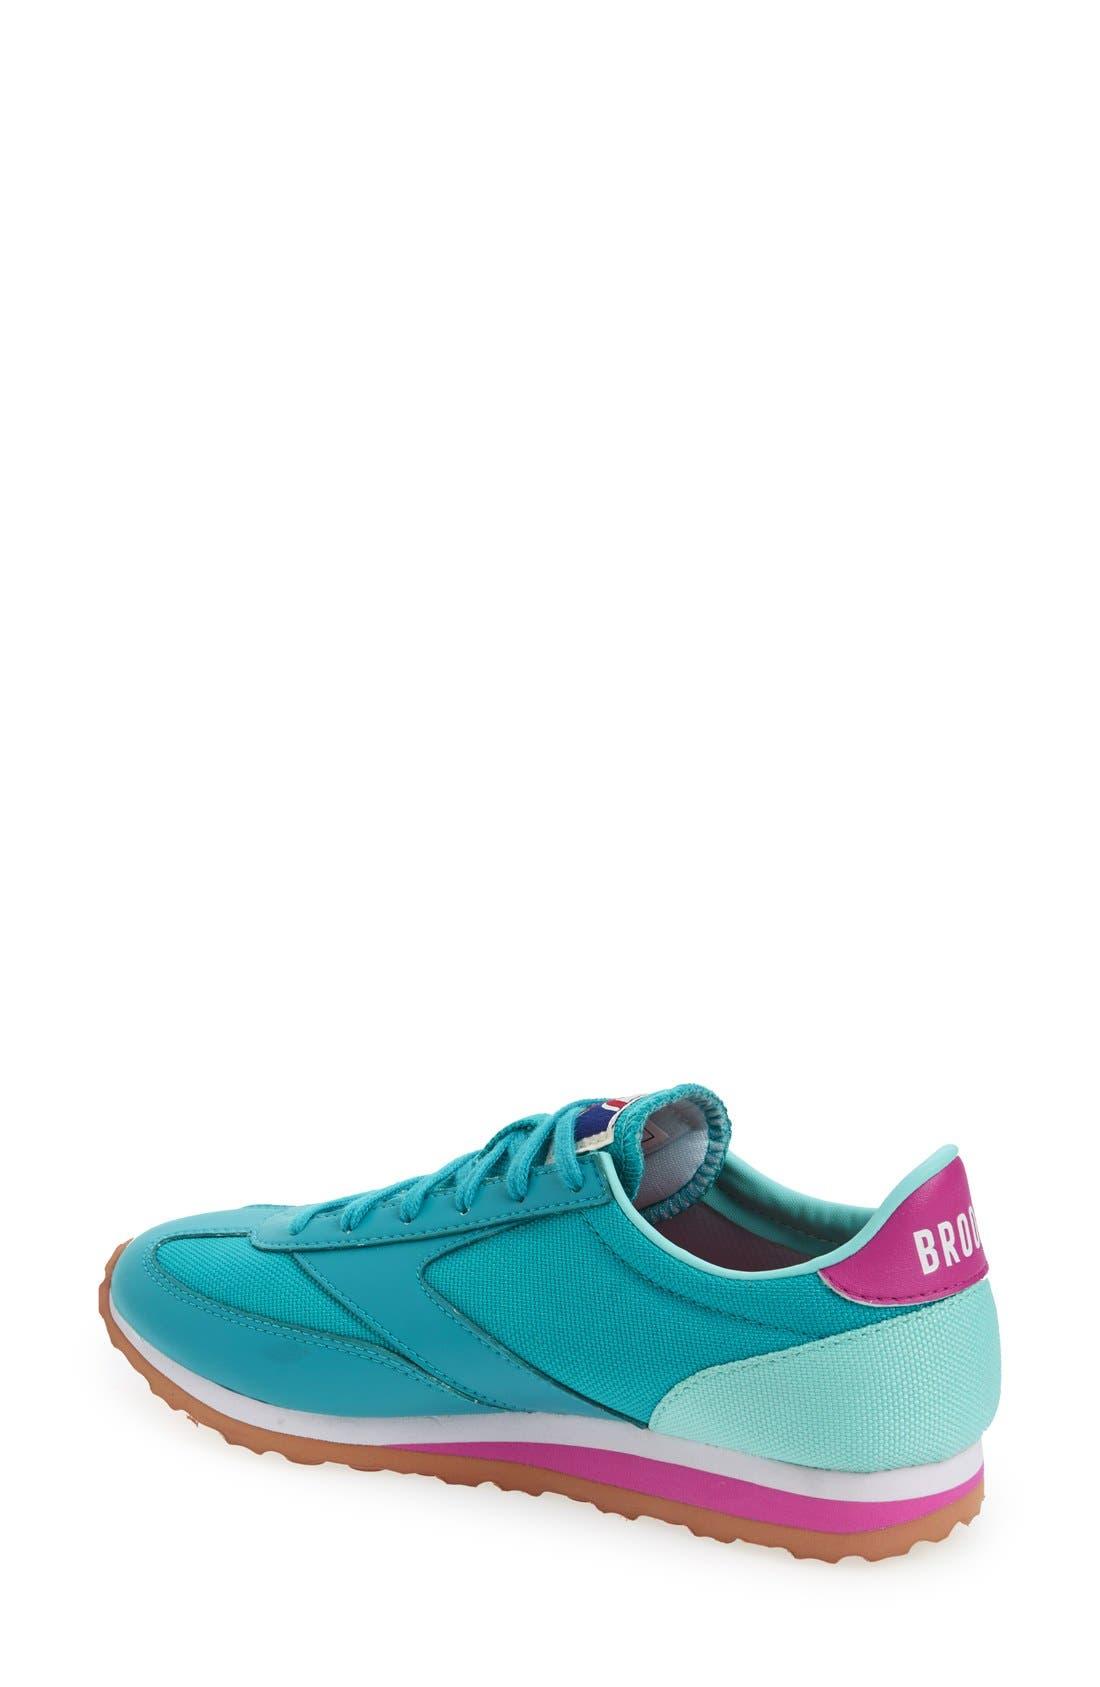 'Vanguard' Sneaker,                             Alternate thumbnail 128, color,